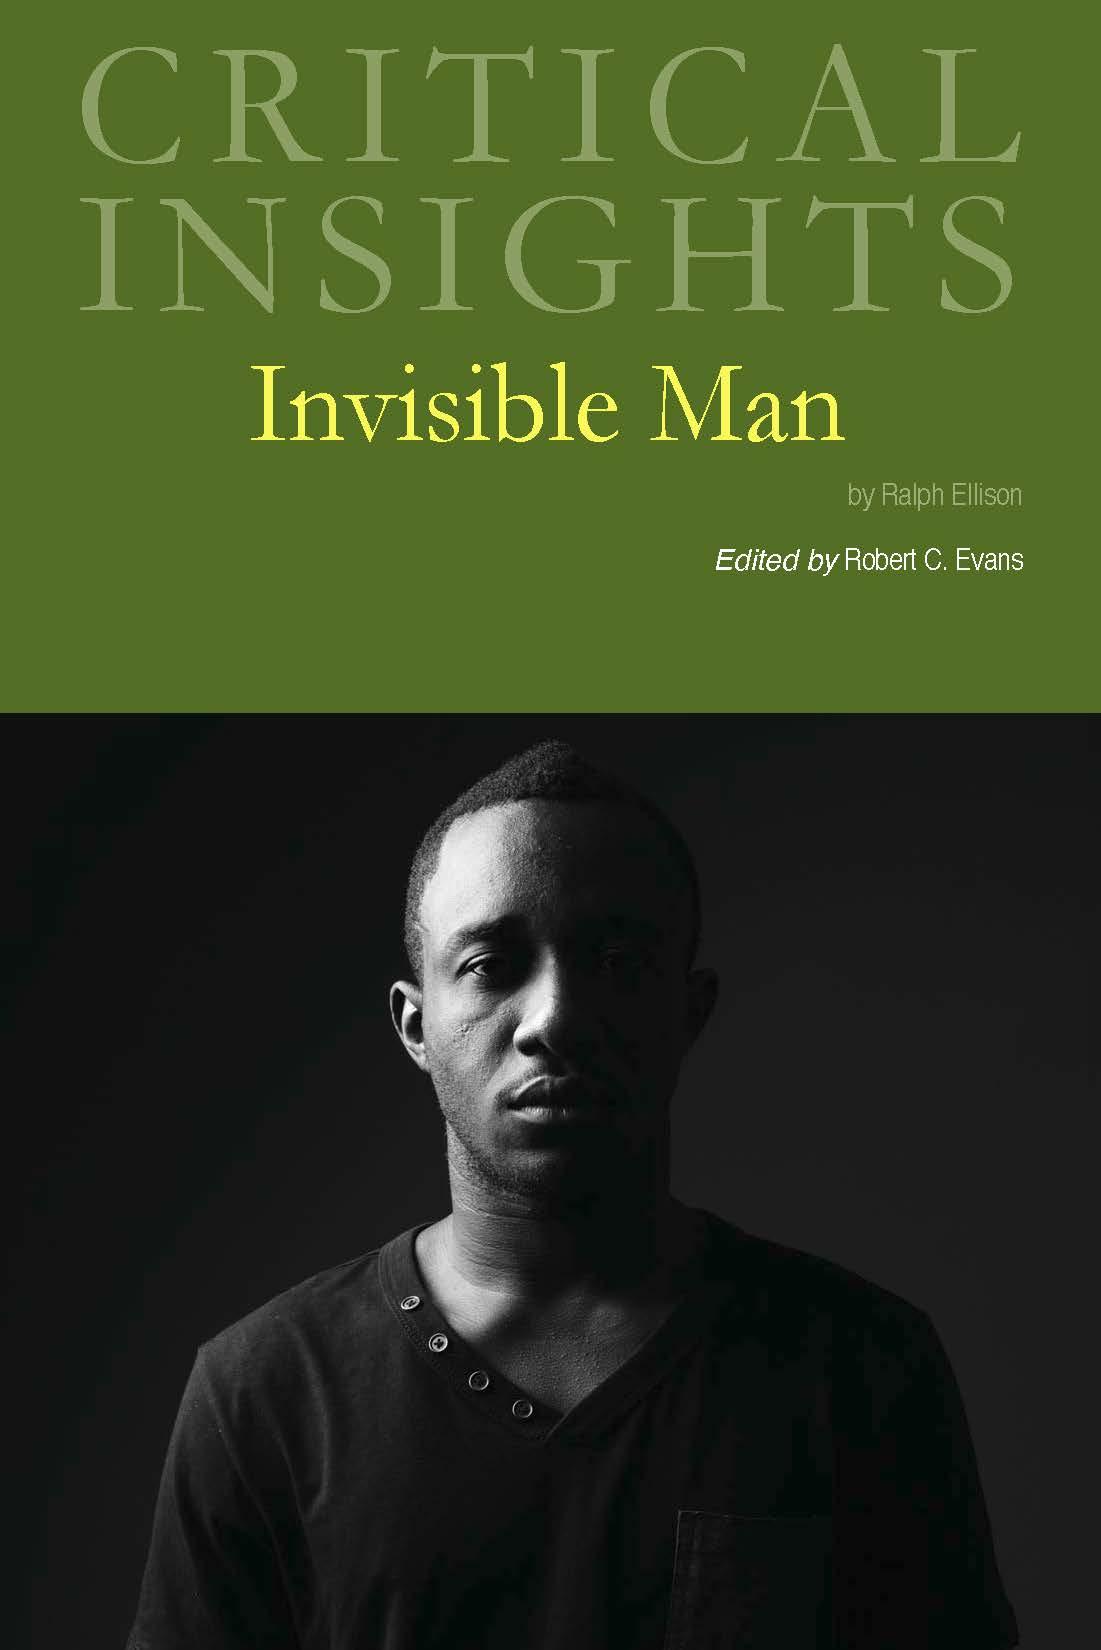 https://0201.nccdn.net/1_2/000/000/14e/b6f/ci-invisible-man-cover-5-oct-21.jpg